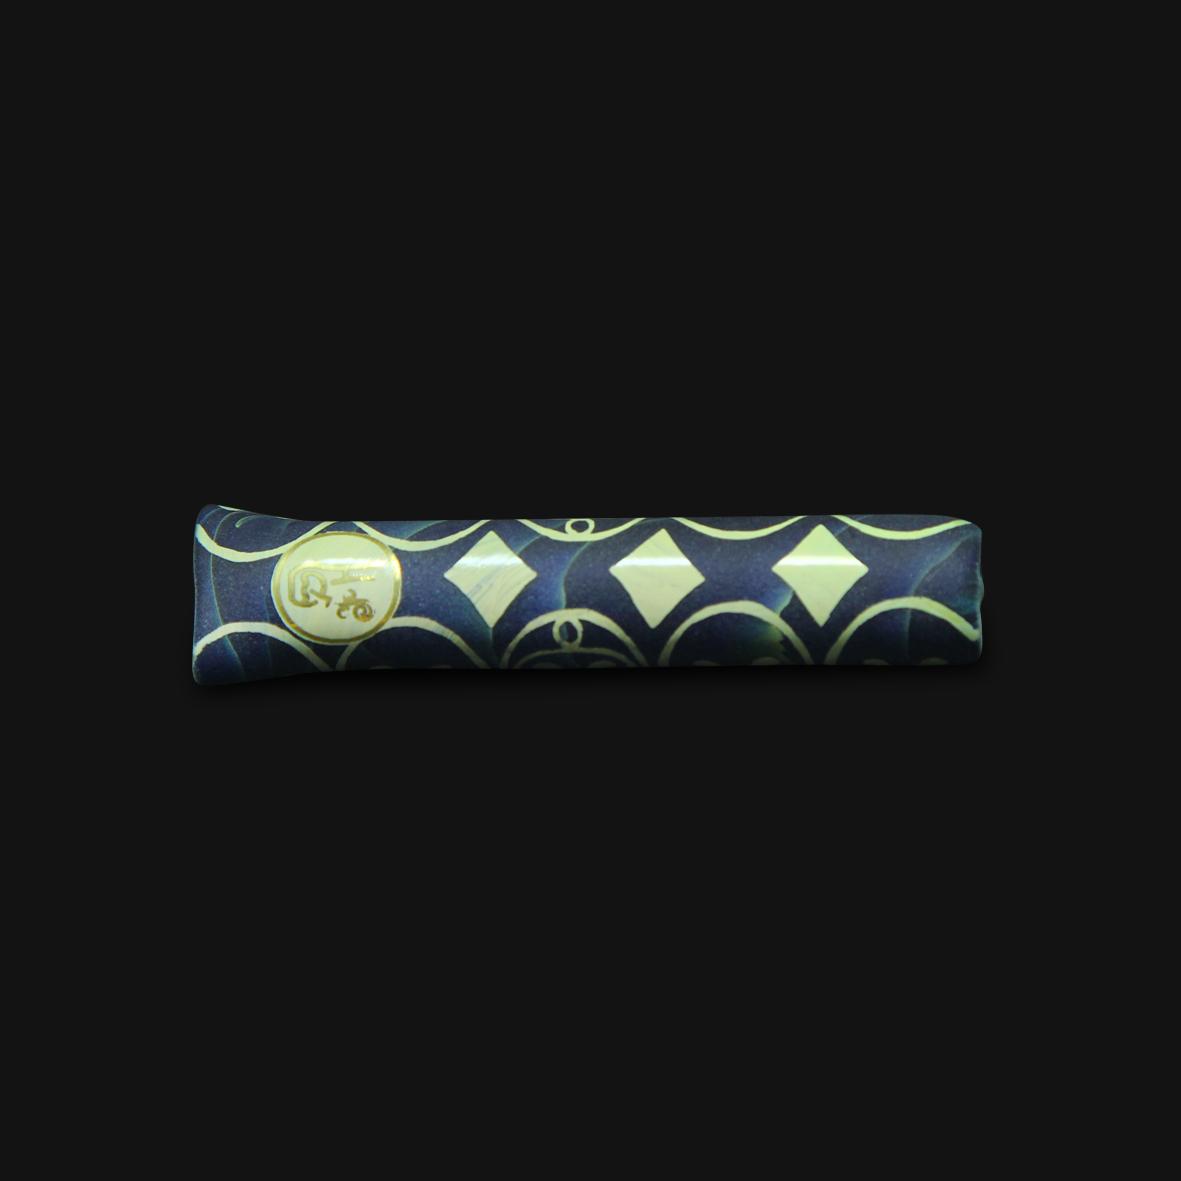 Piteira de Vidro Highblast 2 - Blue Caramel #03